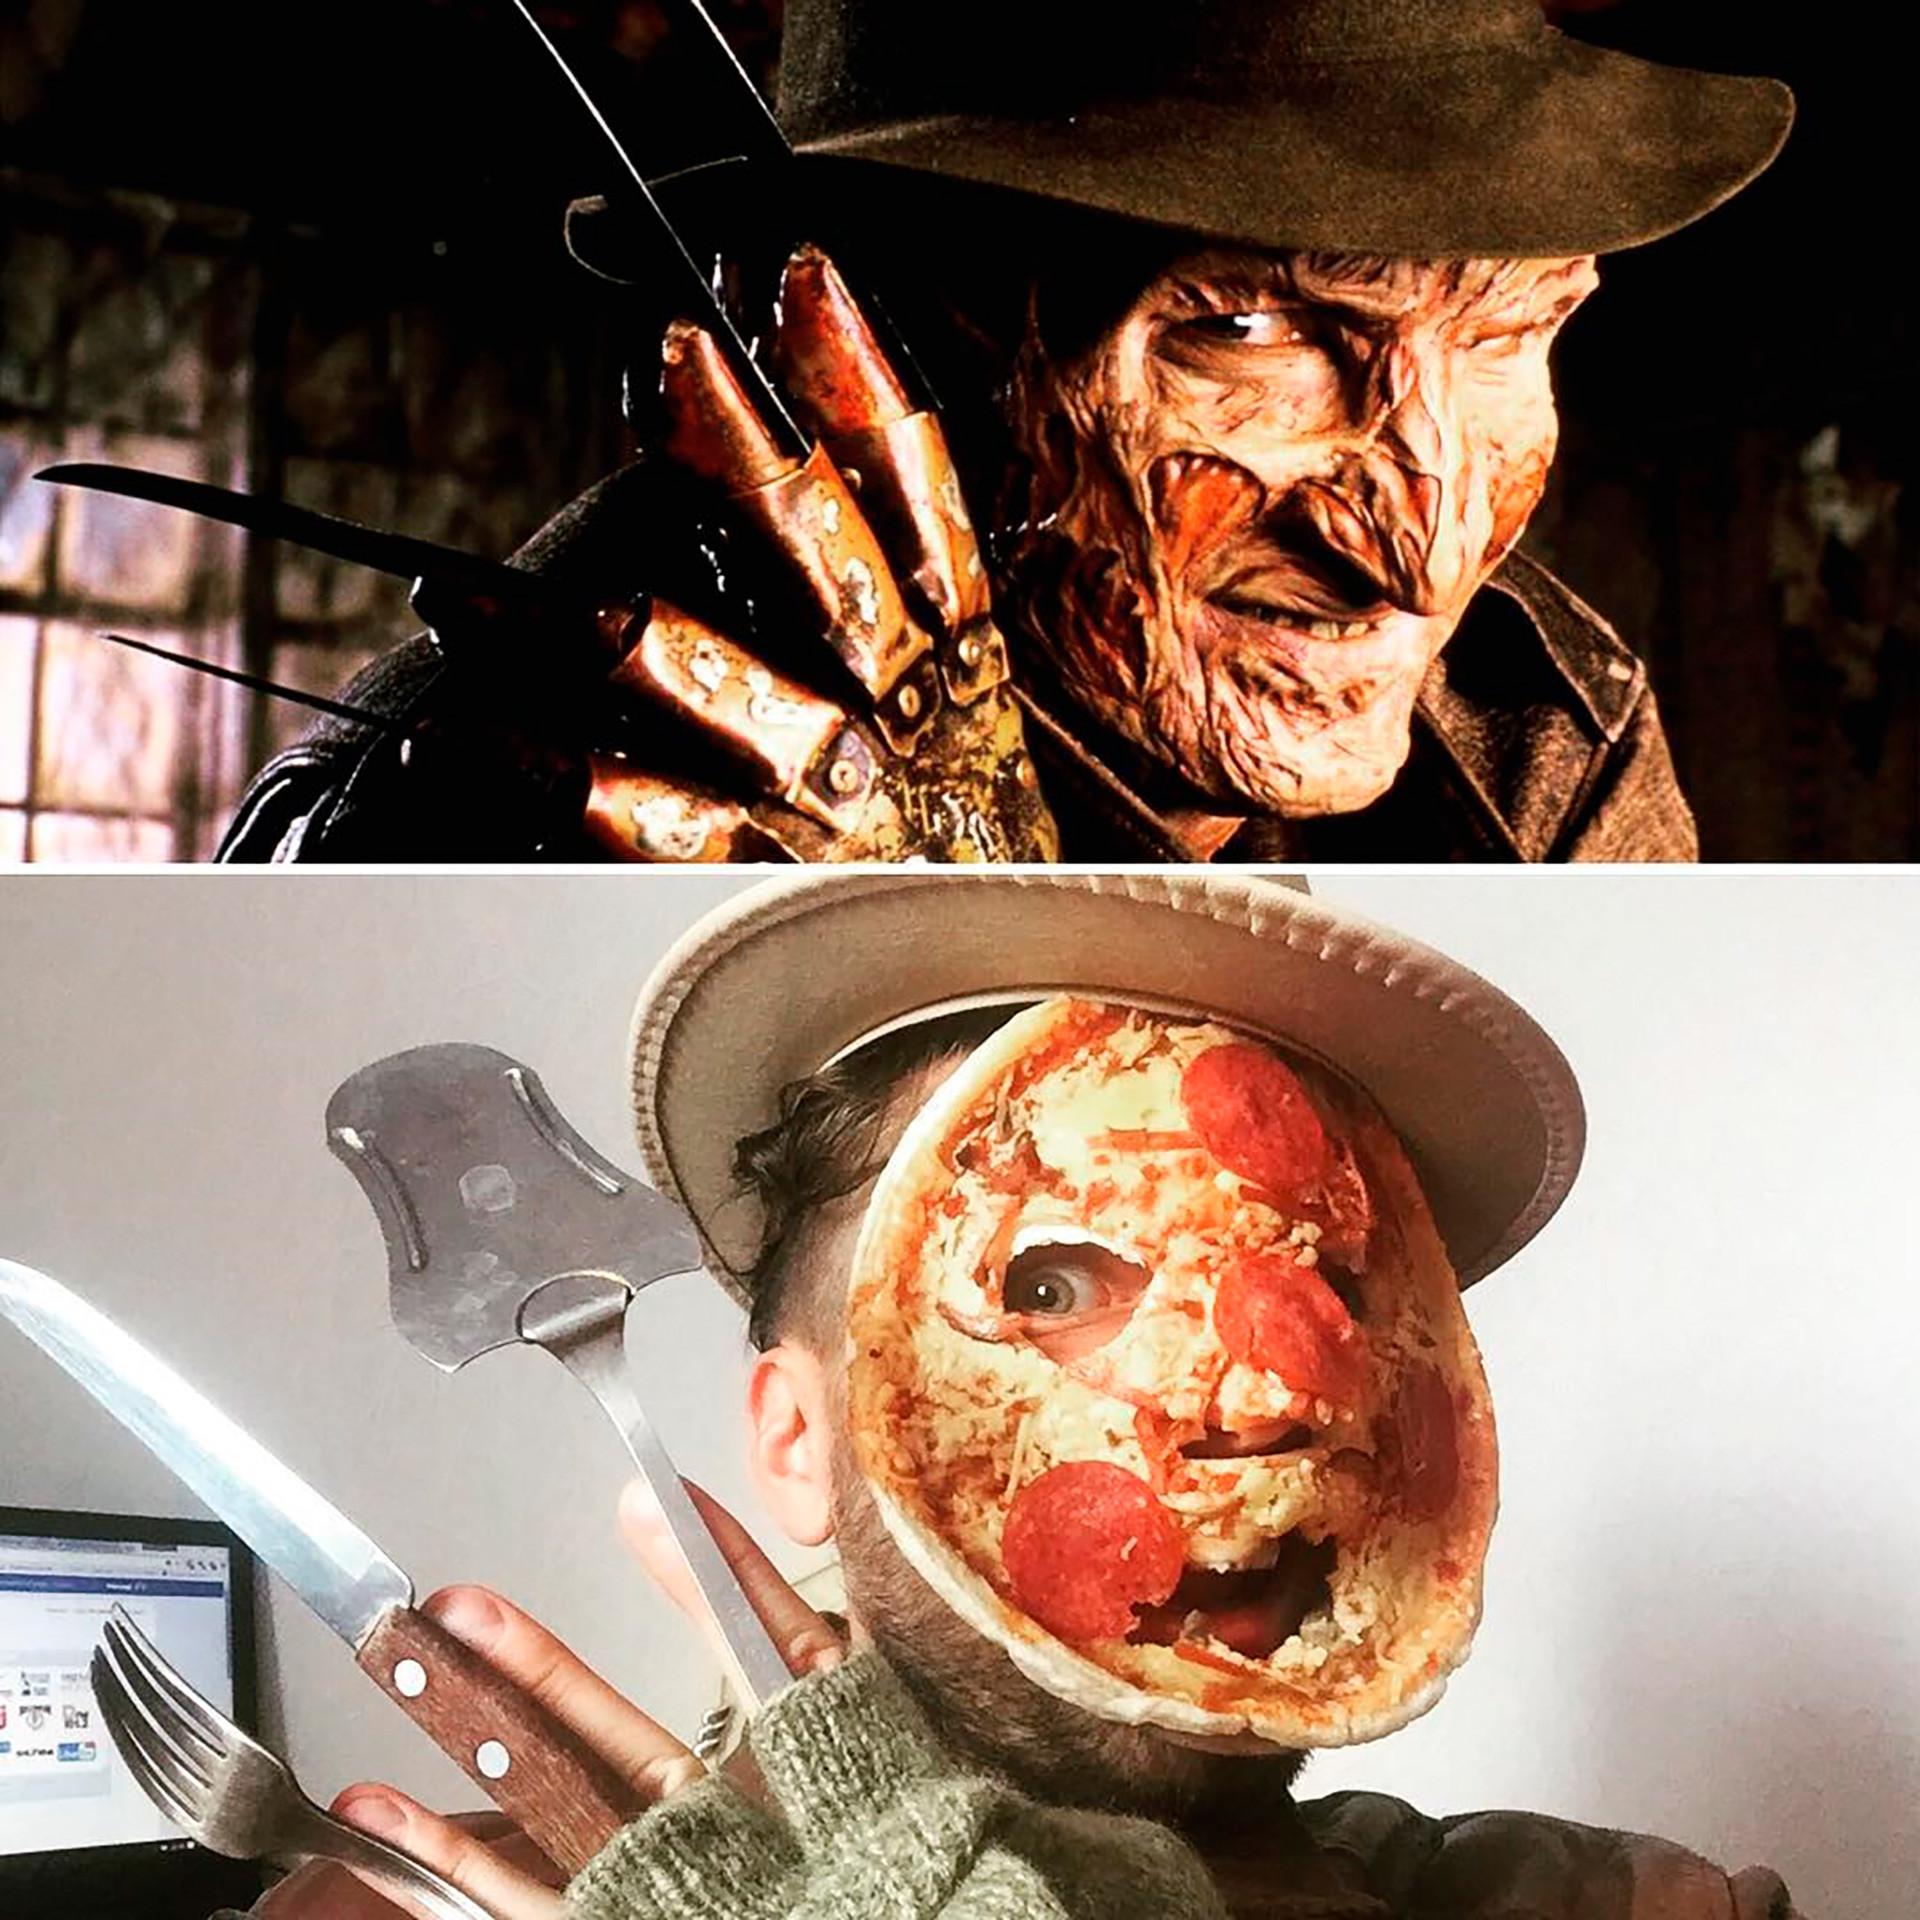 A Nightmare On Elm Street, 2010 by Samuel Bayer / New Line Cinema